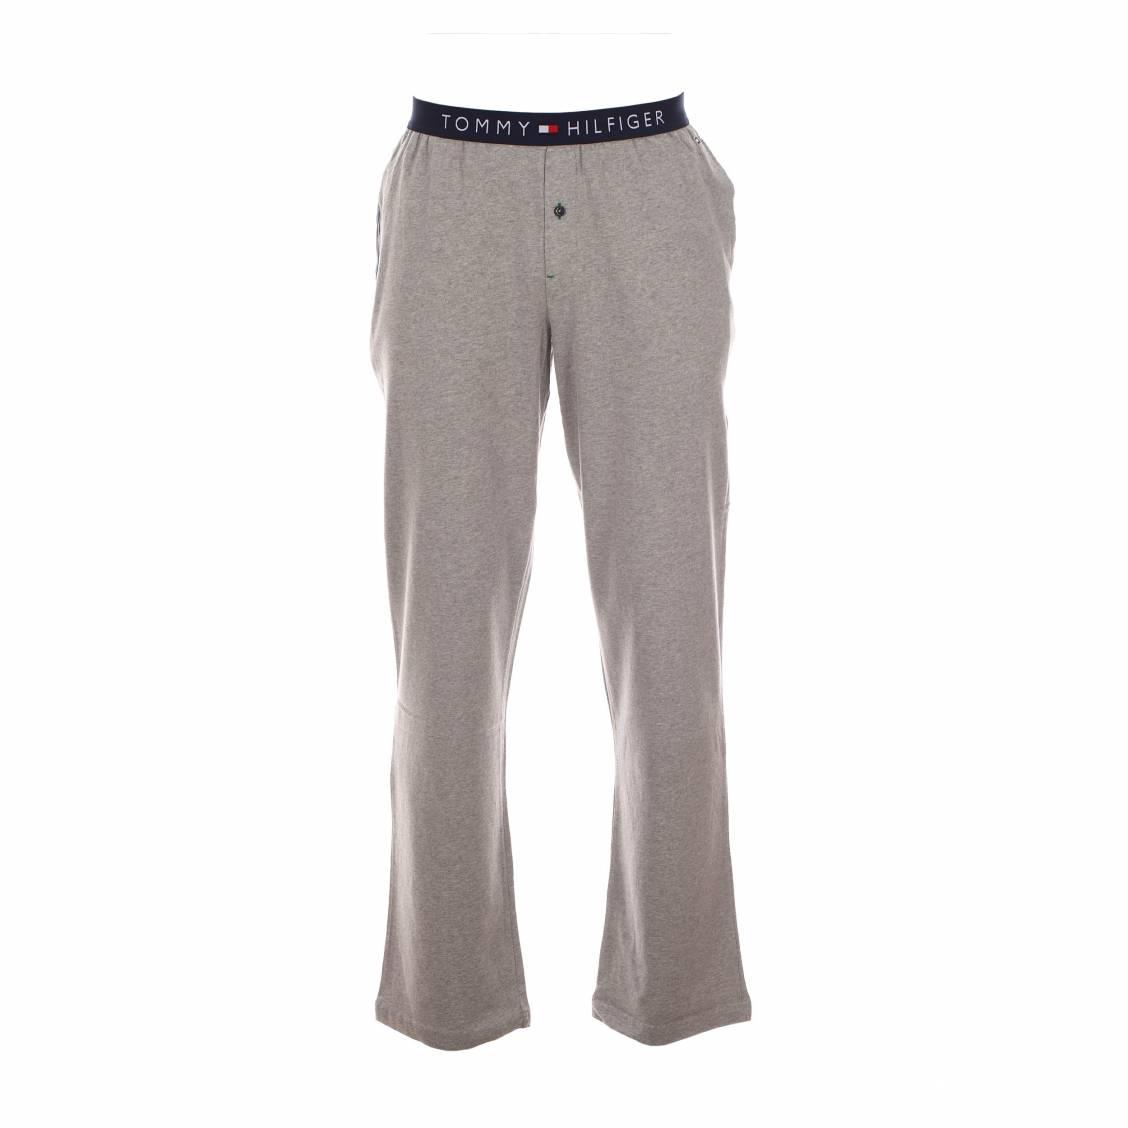 pantalon d 39 int rieur hurman tommy hilfliger en coton gris rue des hommes. Black Bedroom Furniture Sets. Home Design Ideas